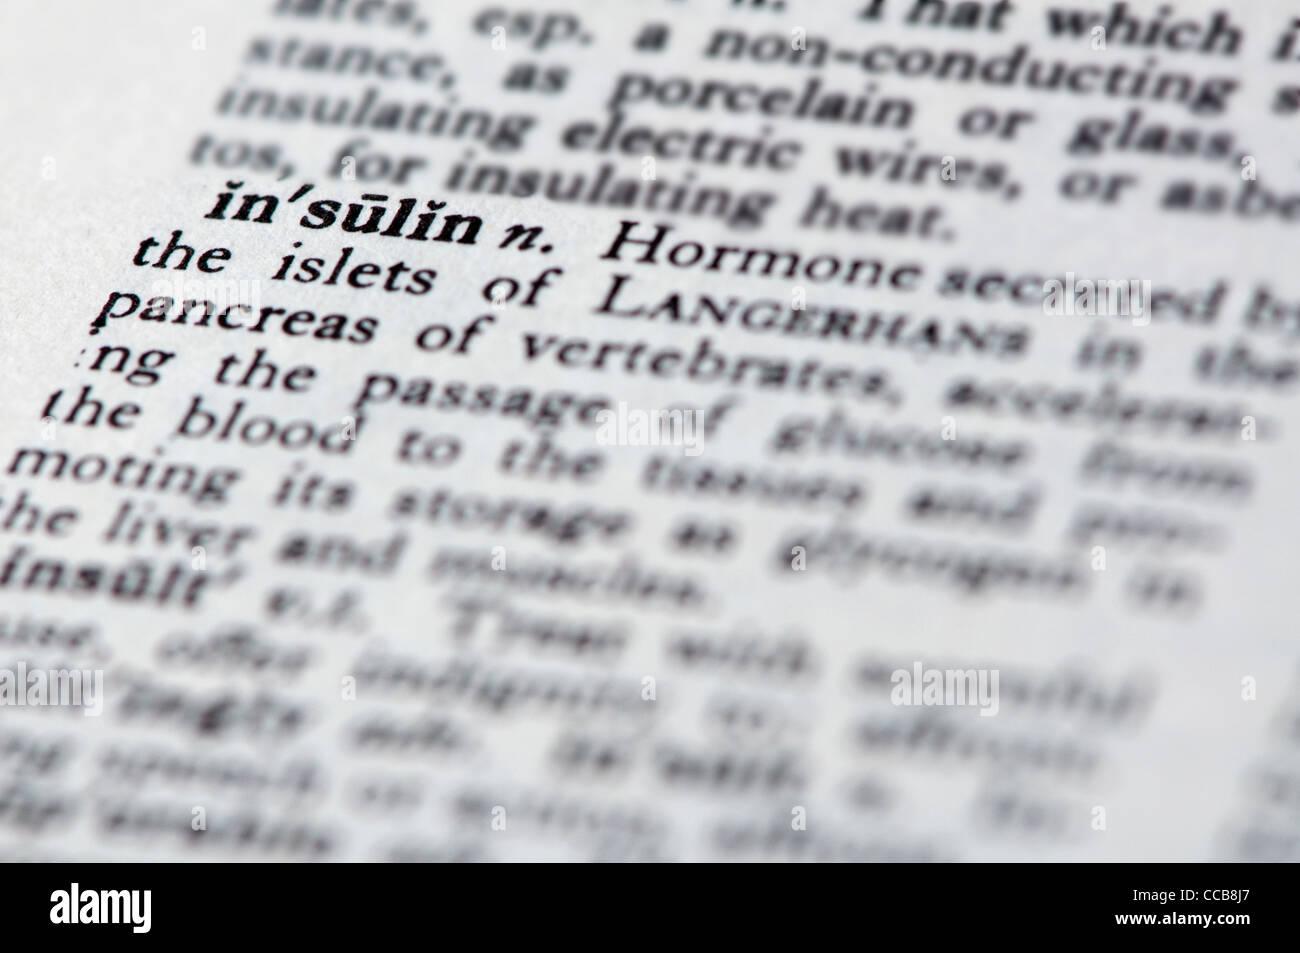 insulin a description in words - Stock Image